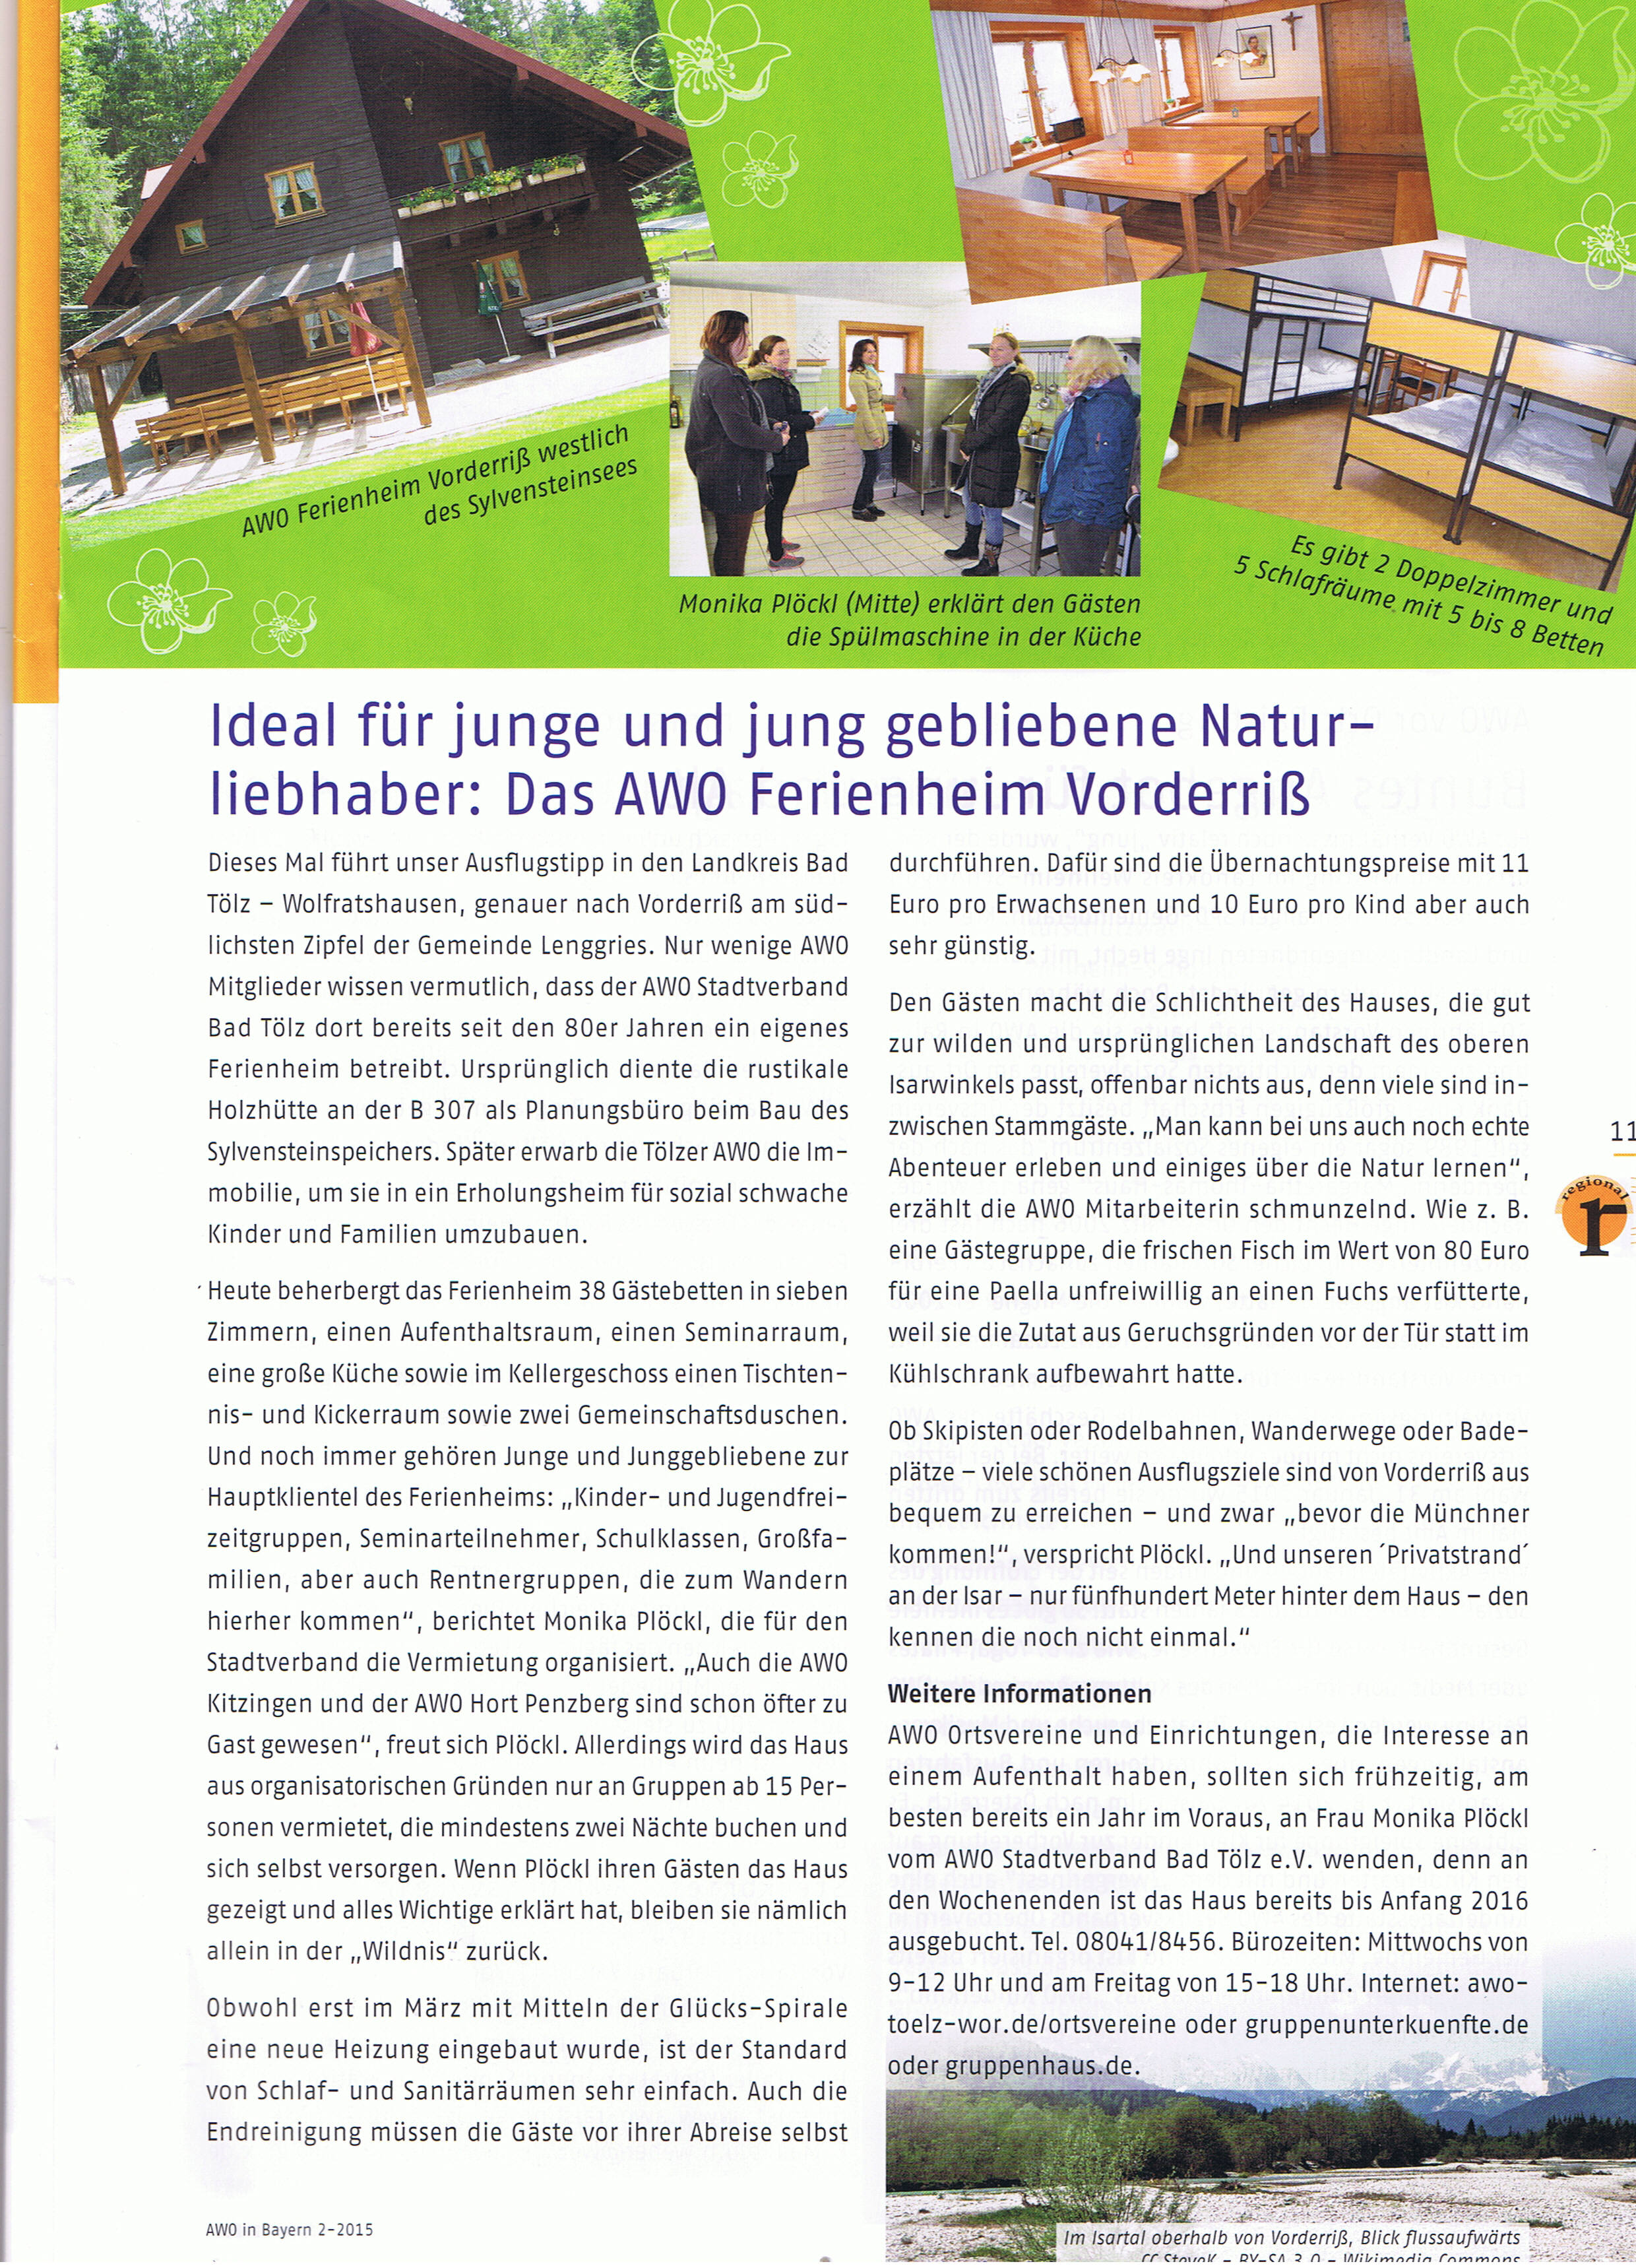 Ferienheim Vorderriß - Artikel AWO-Heft 06-2015